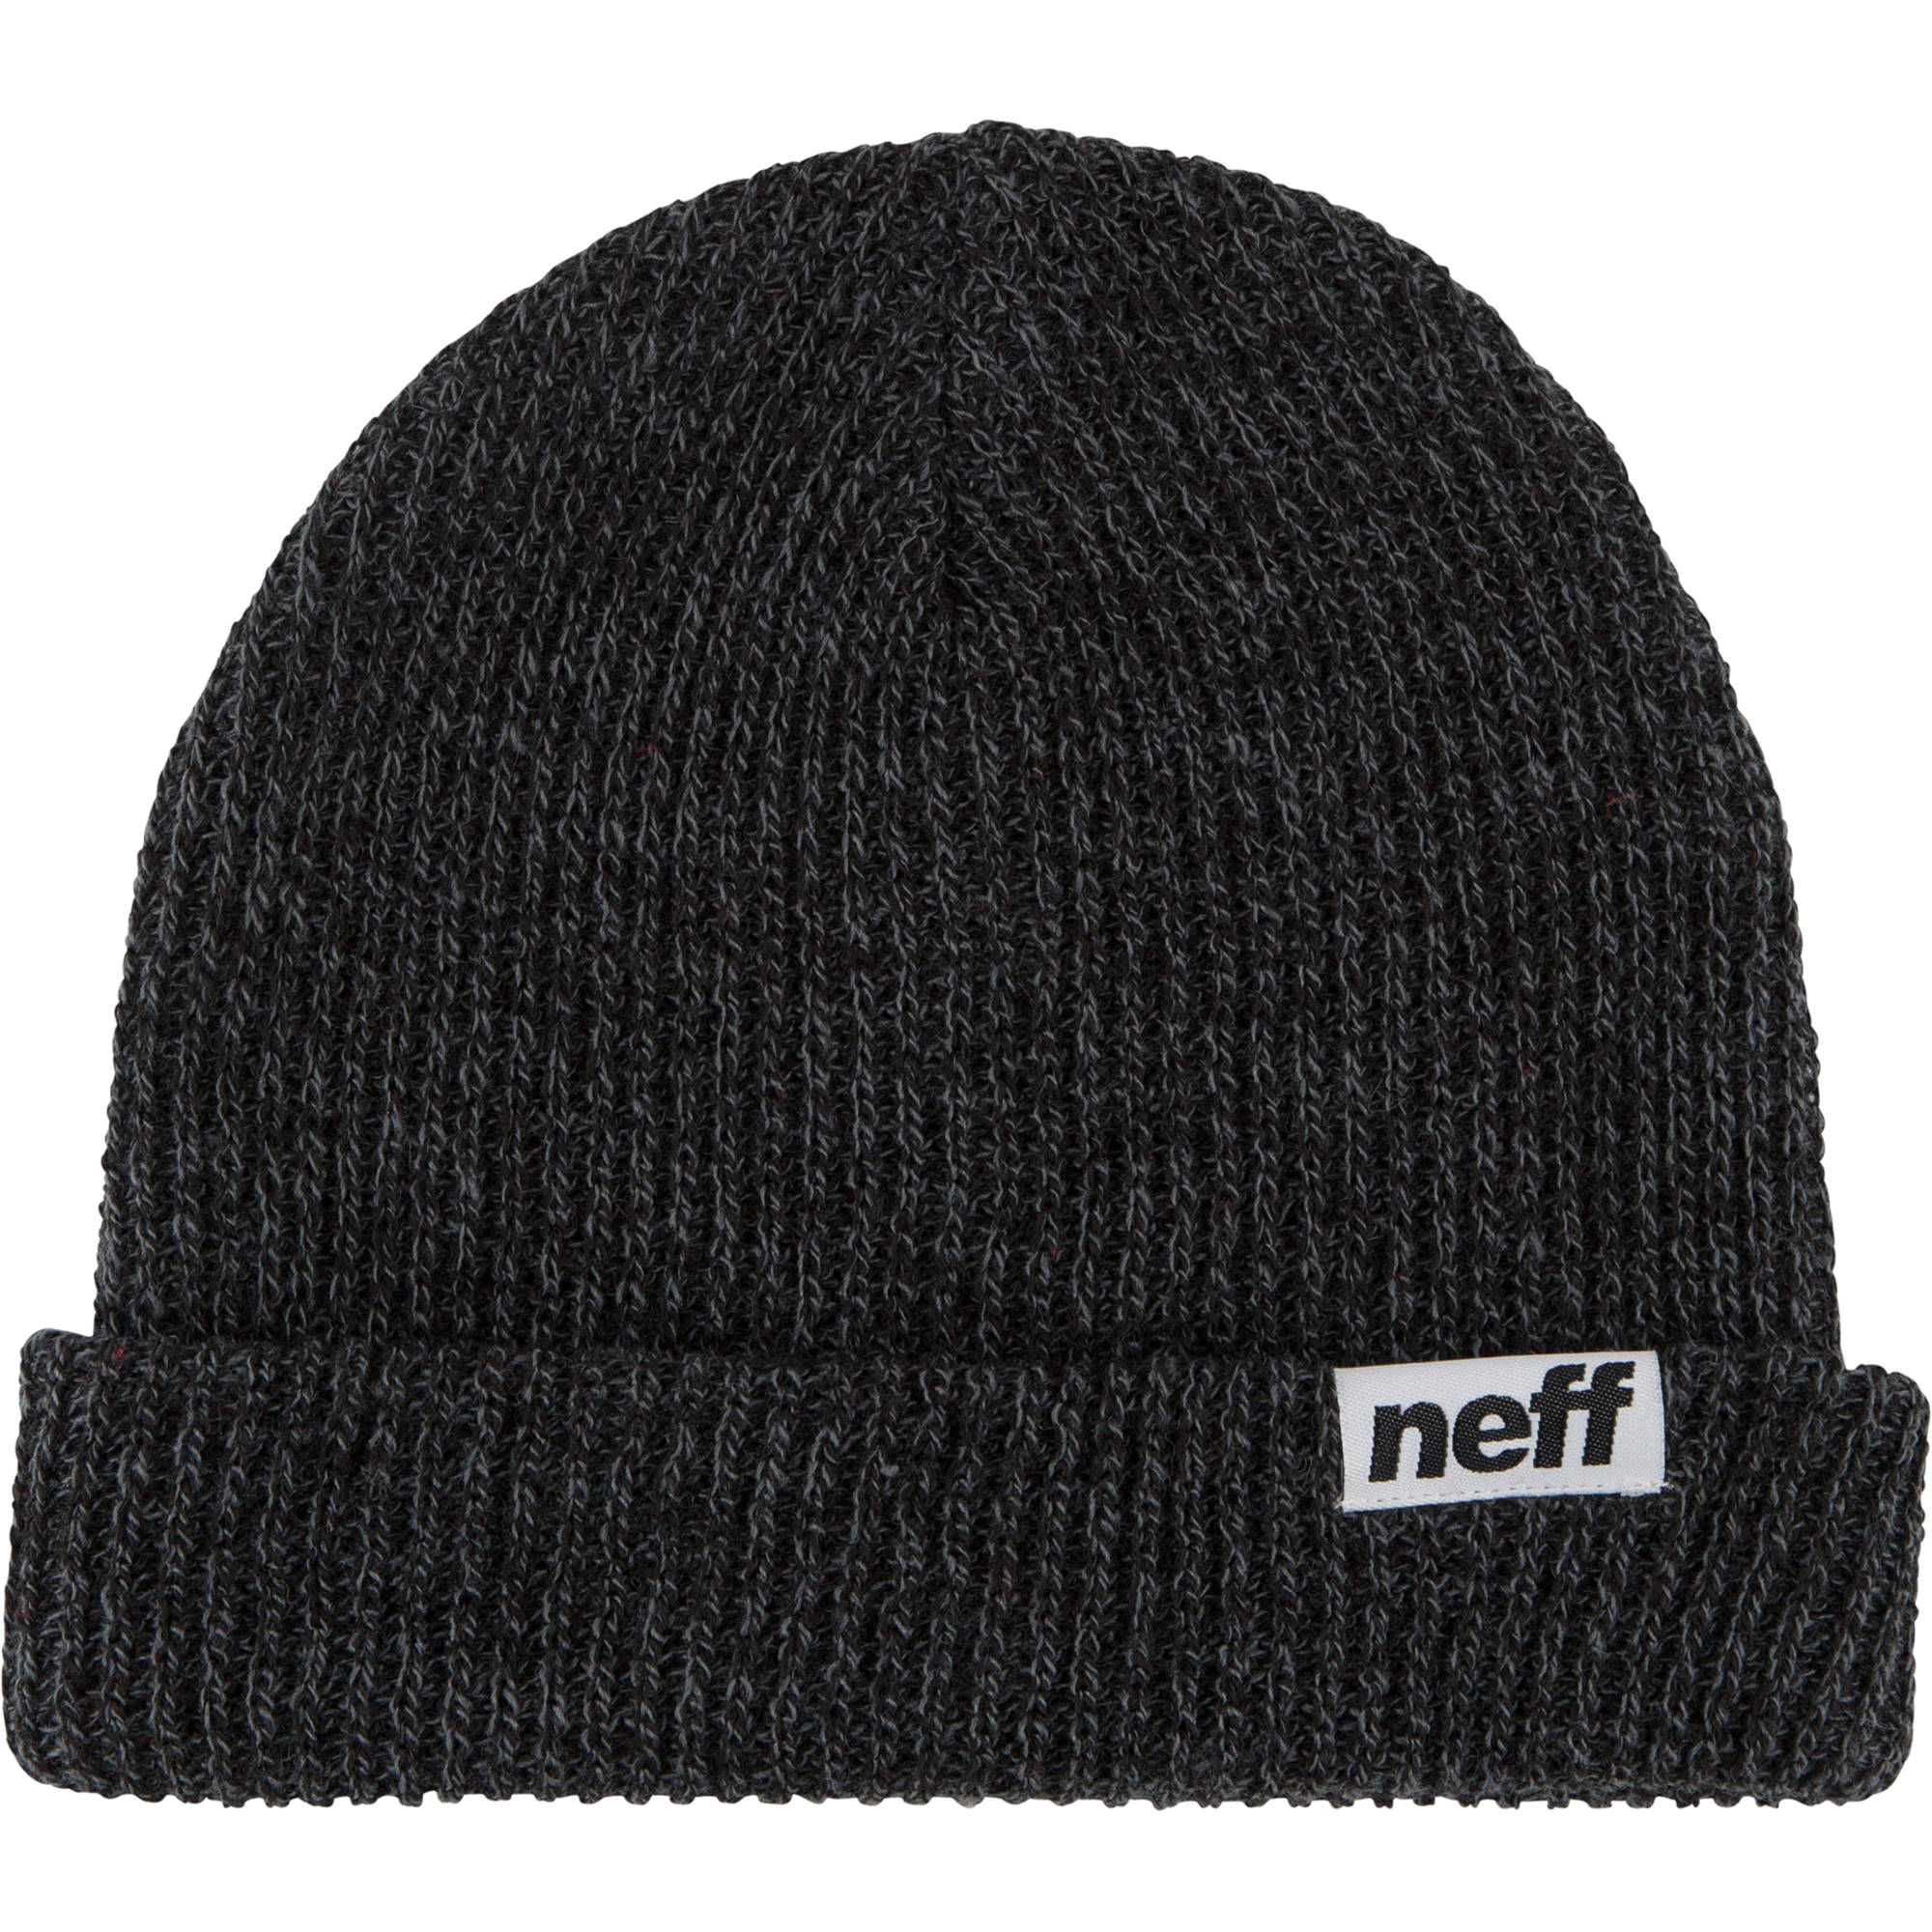 fc4ef1958d5 Neff Fold Heather Beanie (Black Grey) NF00008-BKGY B H Photo